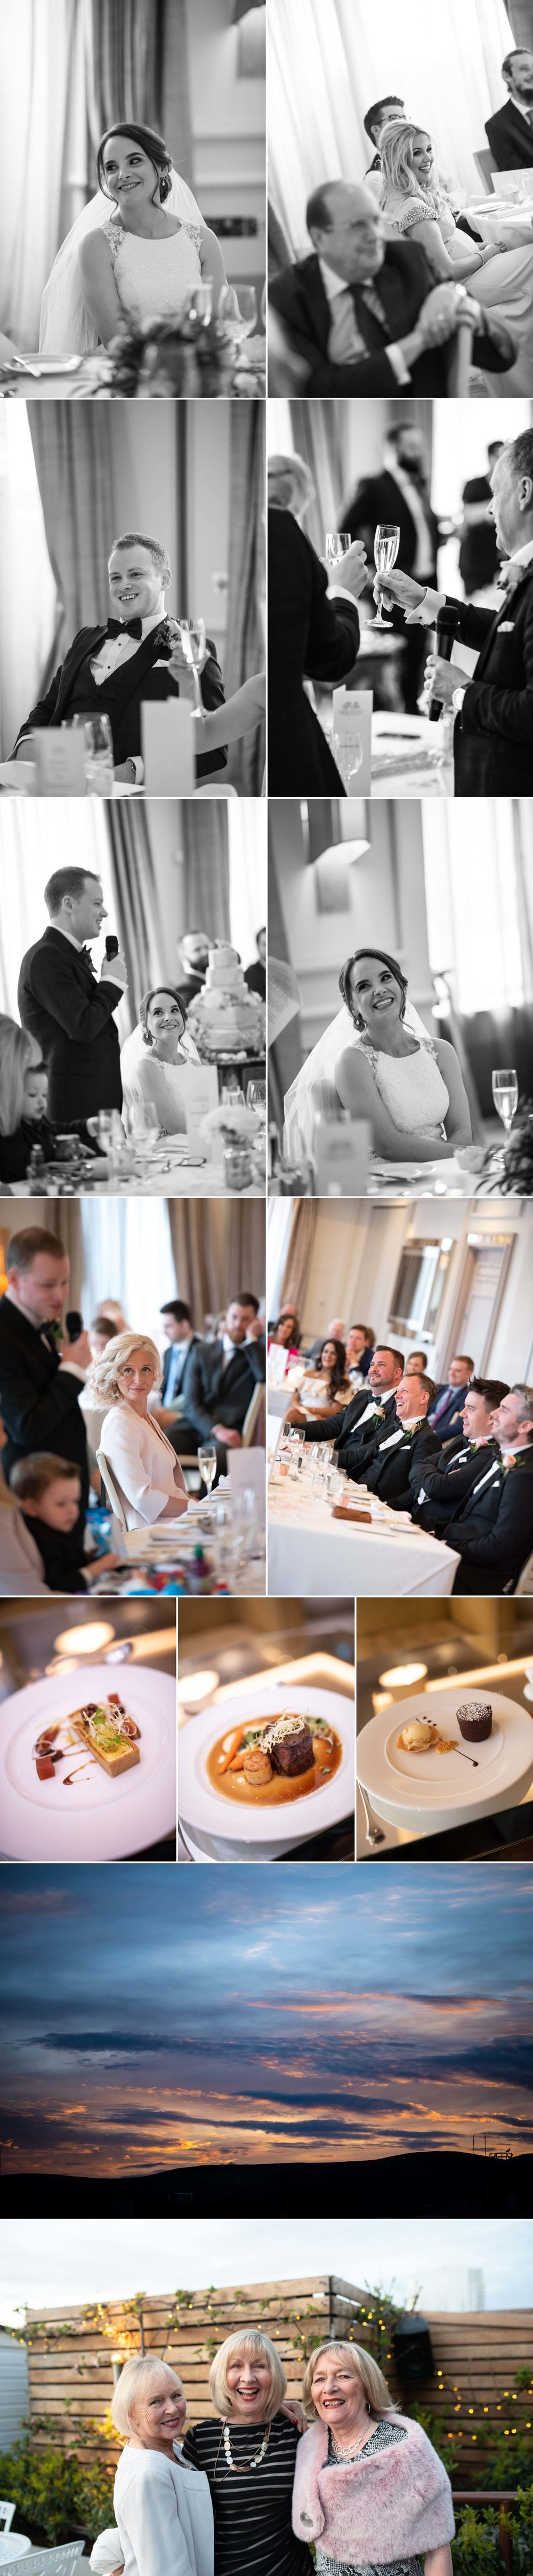 Merchant Hotel Belfast Wedding Photography James McGrillis 19.jpg